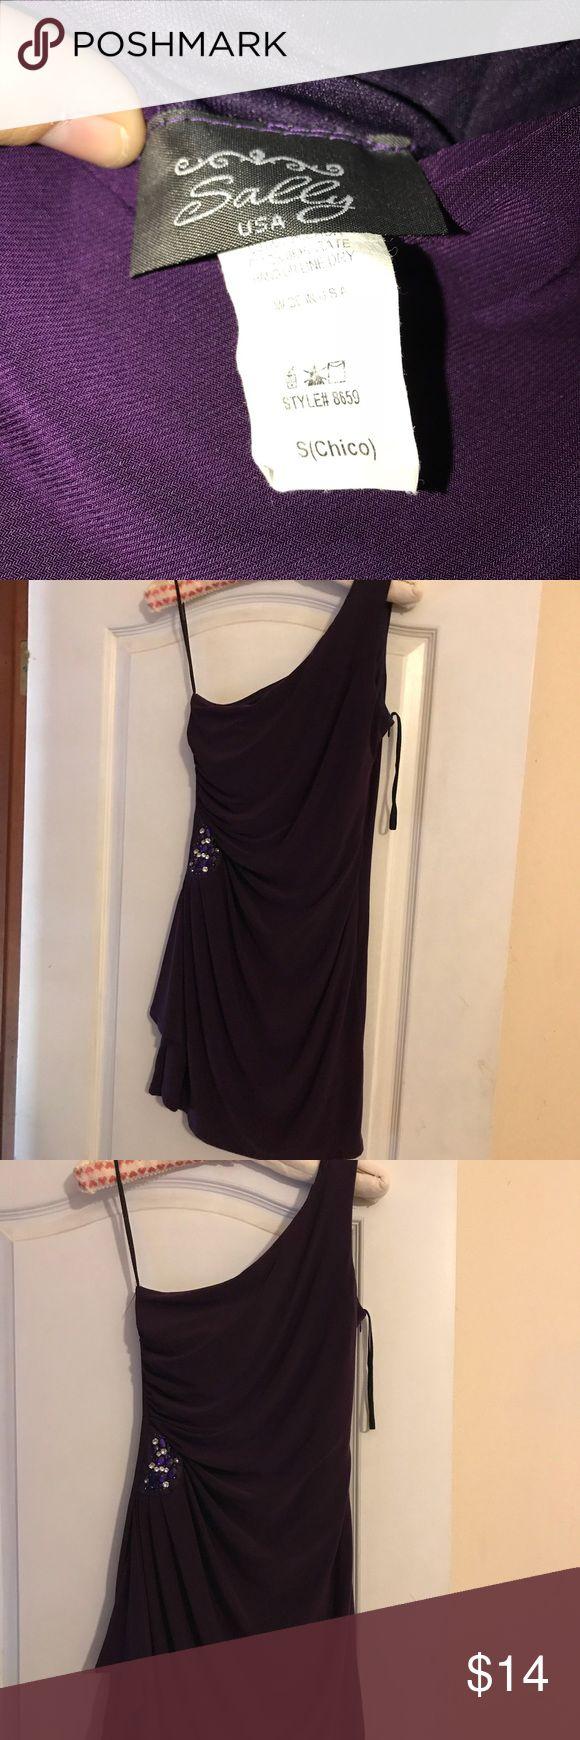 Dark purple off the shoulder dress. Size small dark purple dress. NWOT. Tag says Sally USA but I bought it on dress.com has a zipper on the side sally USA Dresses Mini